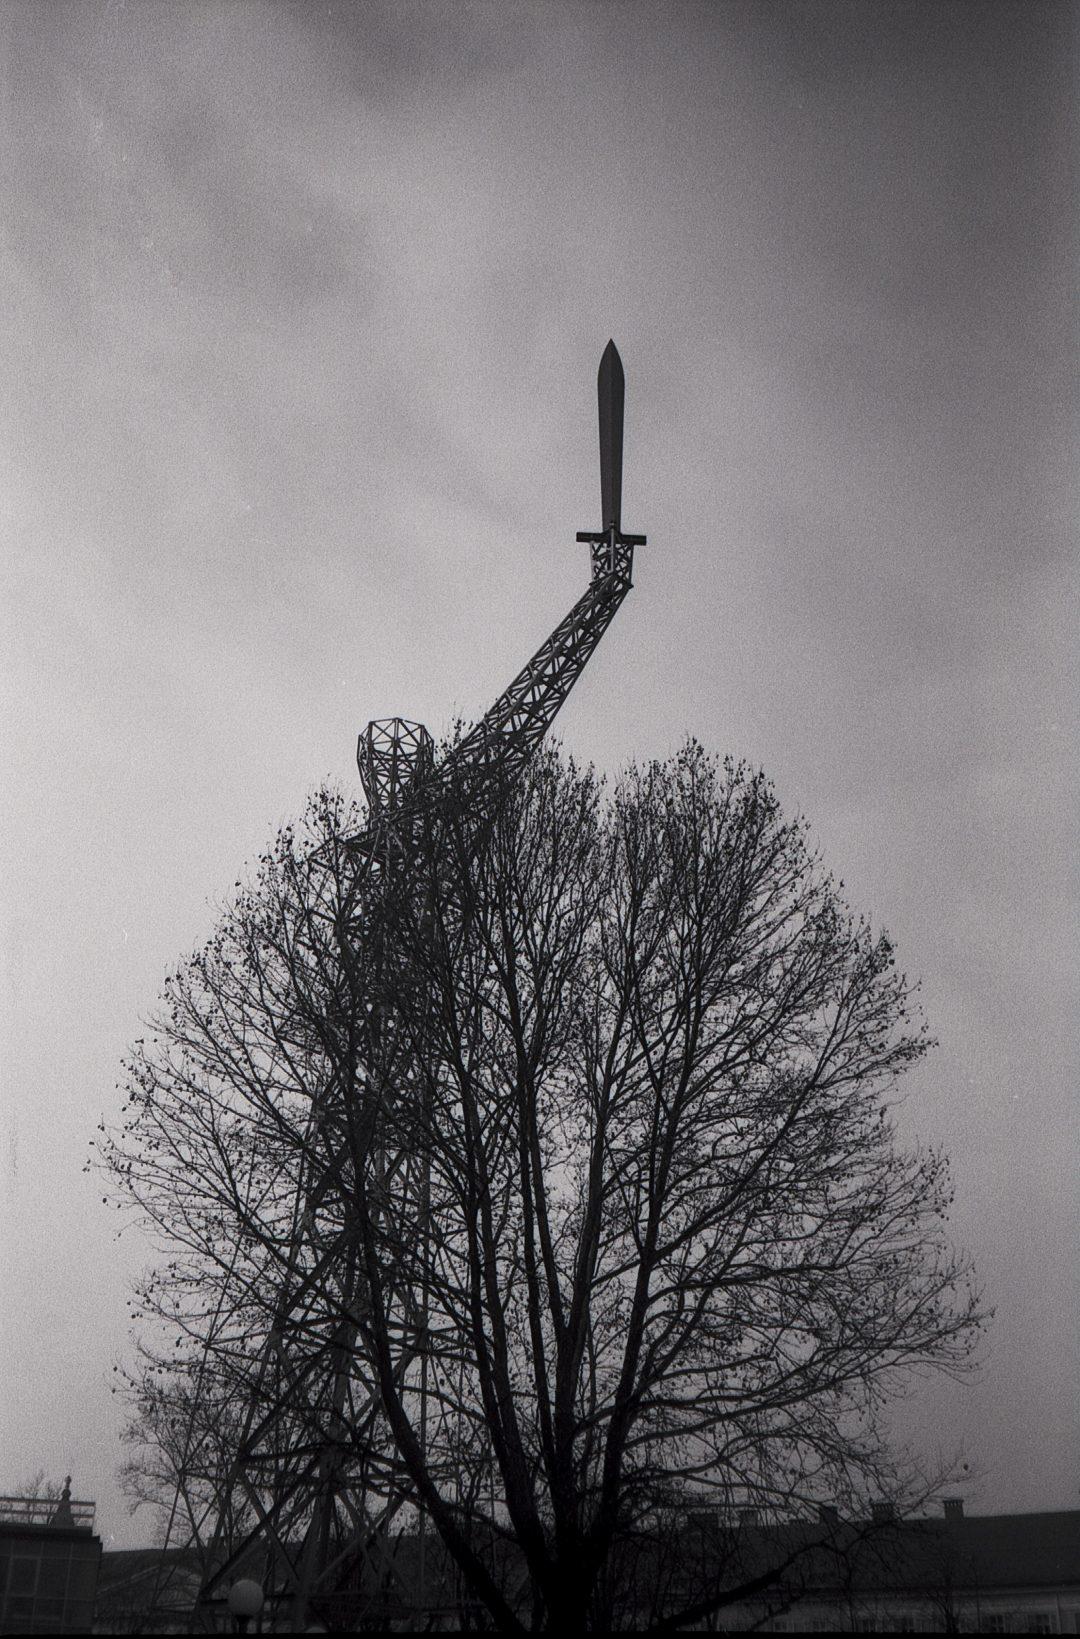 #021 Film per day – Lichtschwert – Light Sword Sculpture